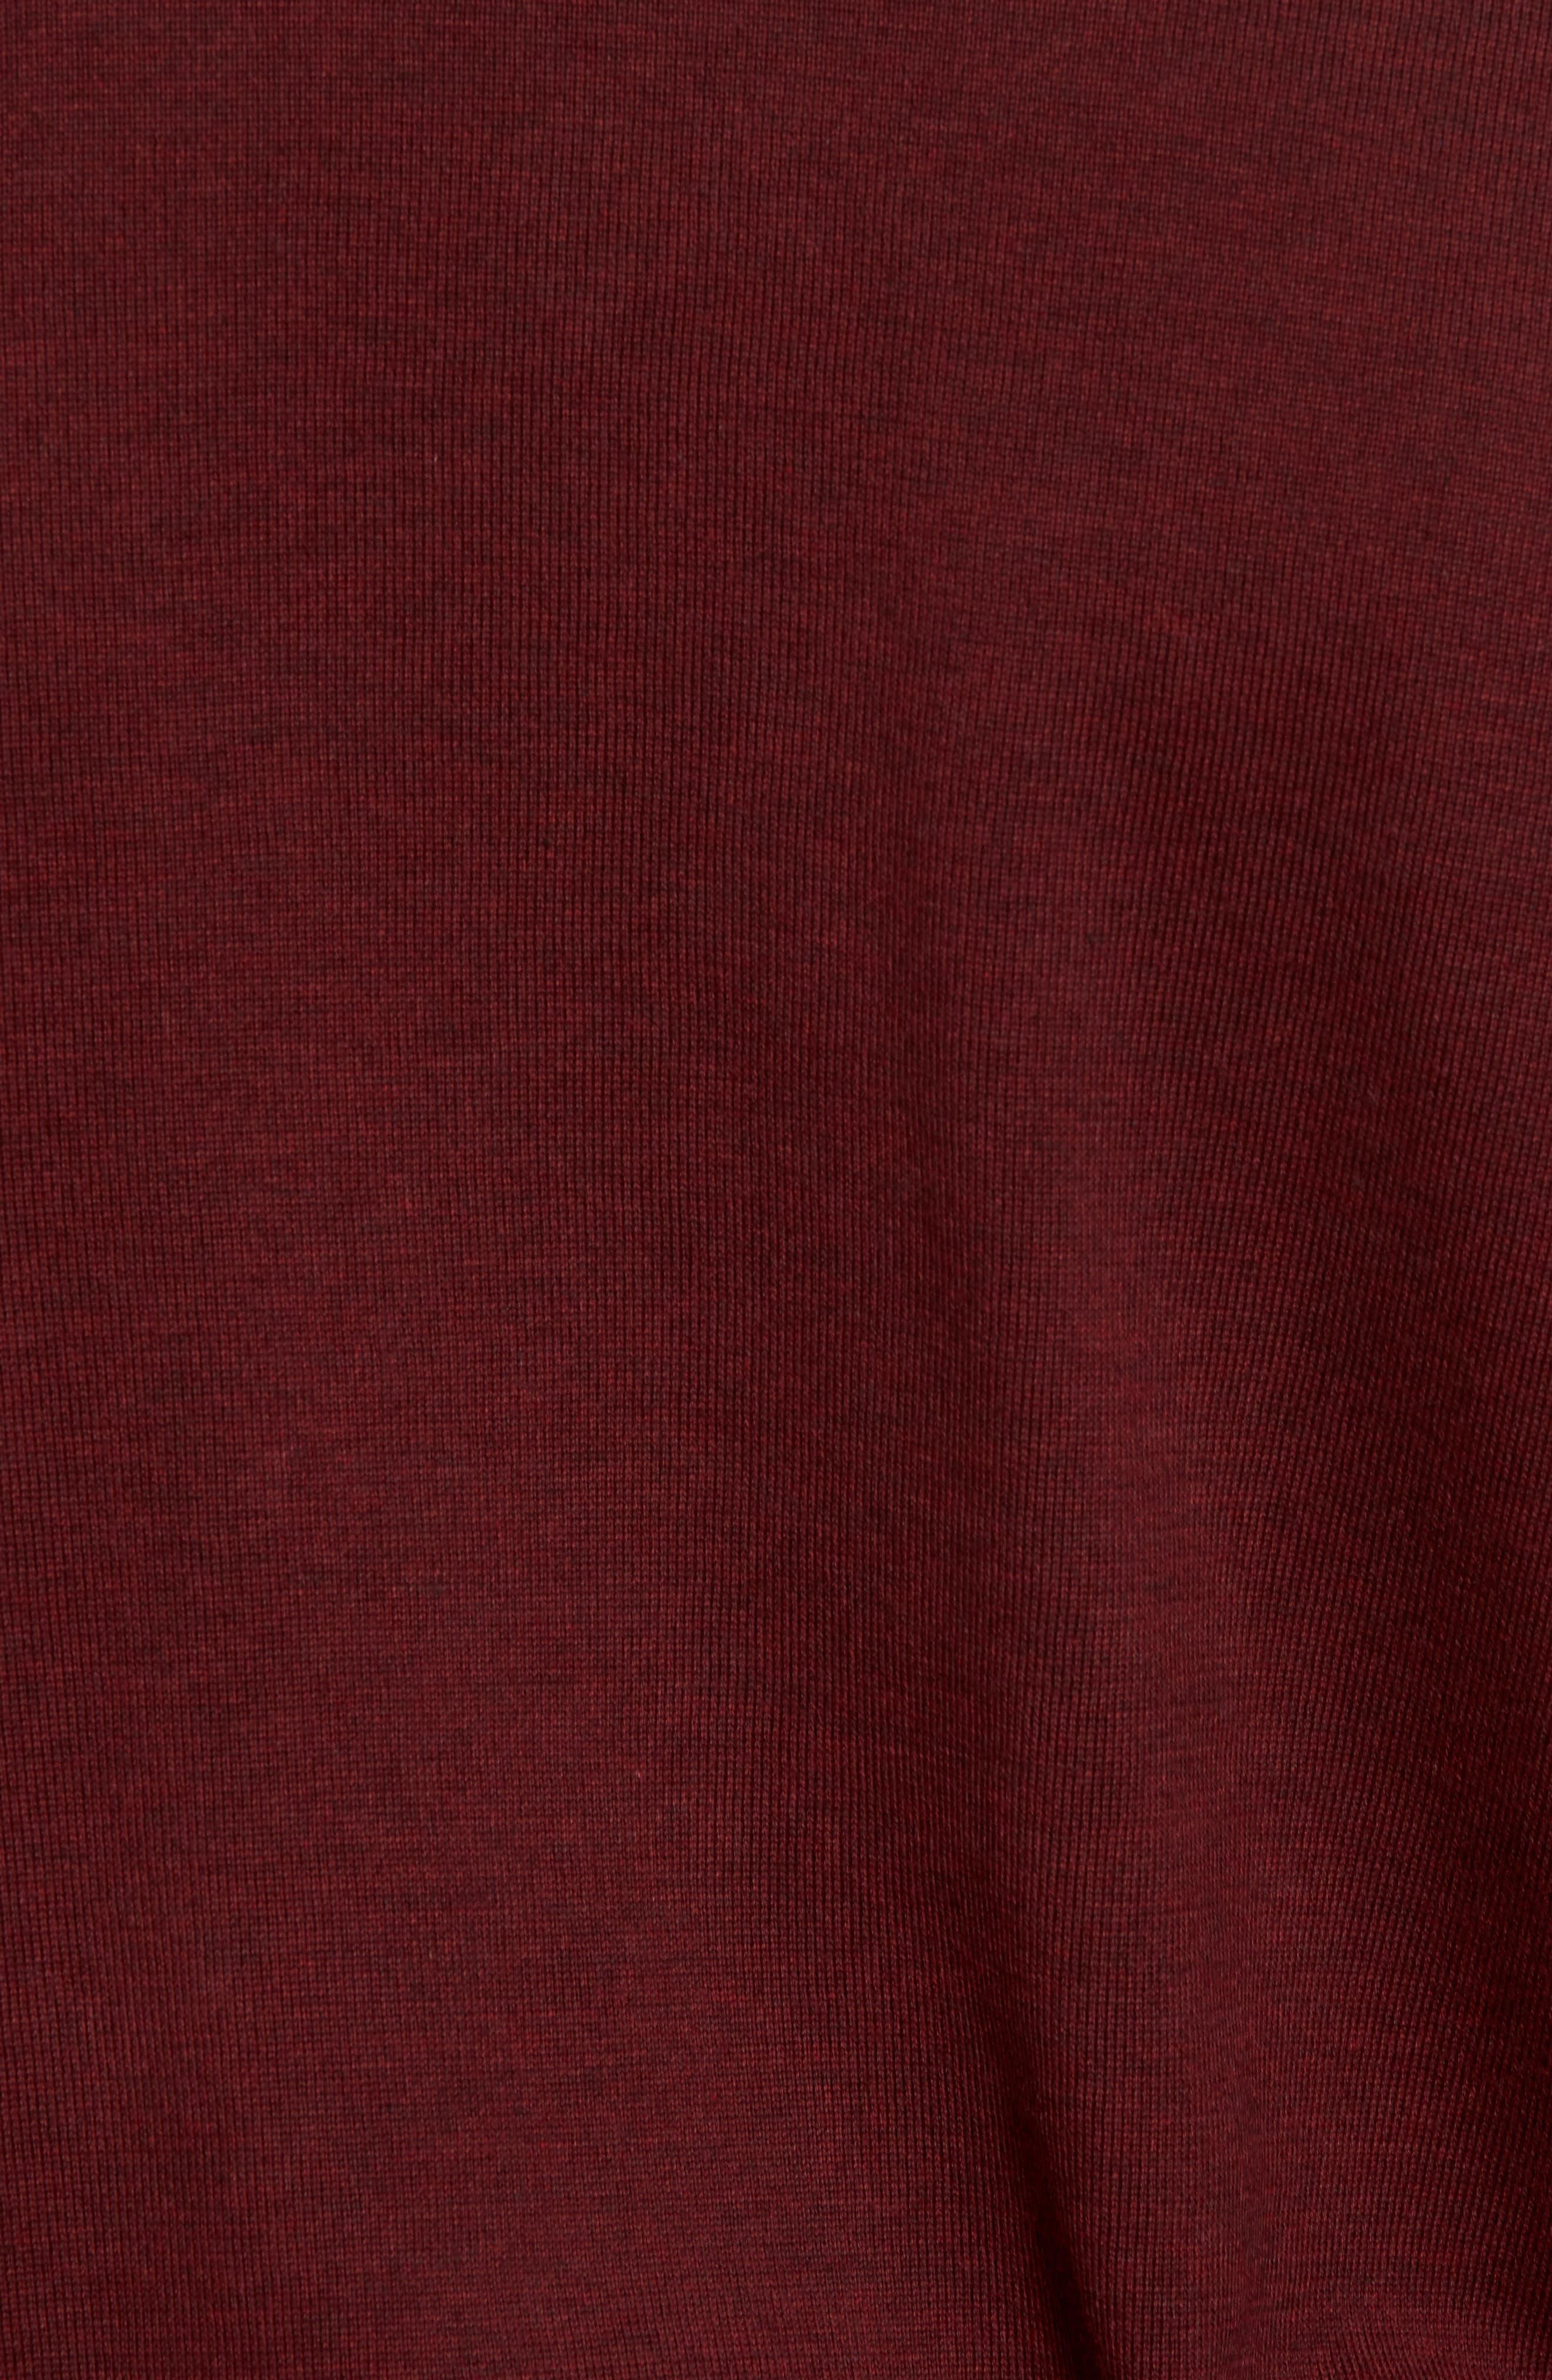 Cotton Jersey V-Neck Sweater,                             Alternate thumbnail 26, color,